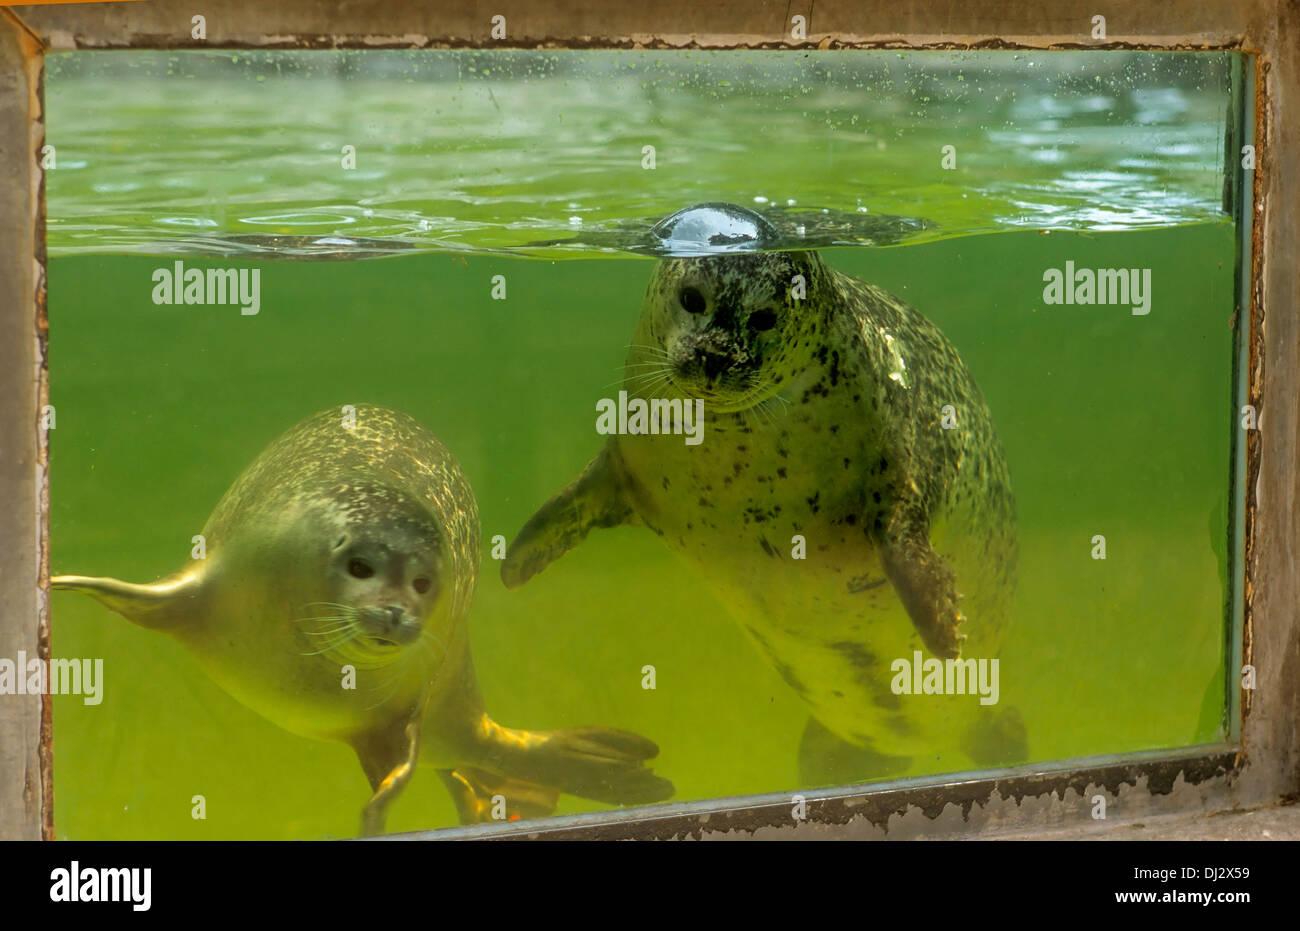 harbour seal (Phoca vitulina), common seal, Seehunde unter Wasser, Seehund (Phoca vitulina) - Stock Image